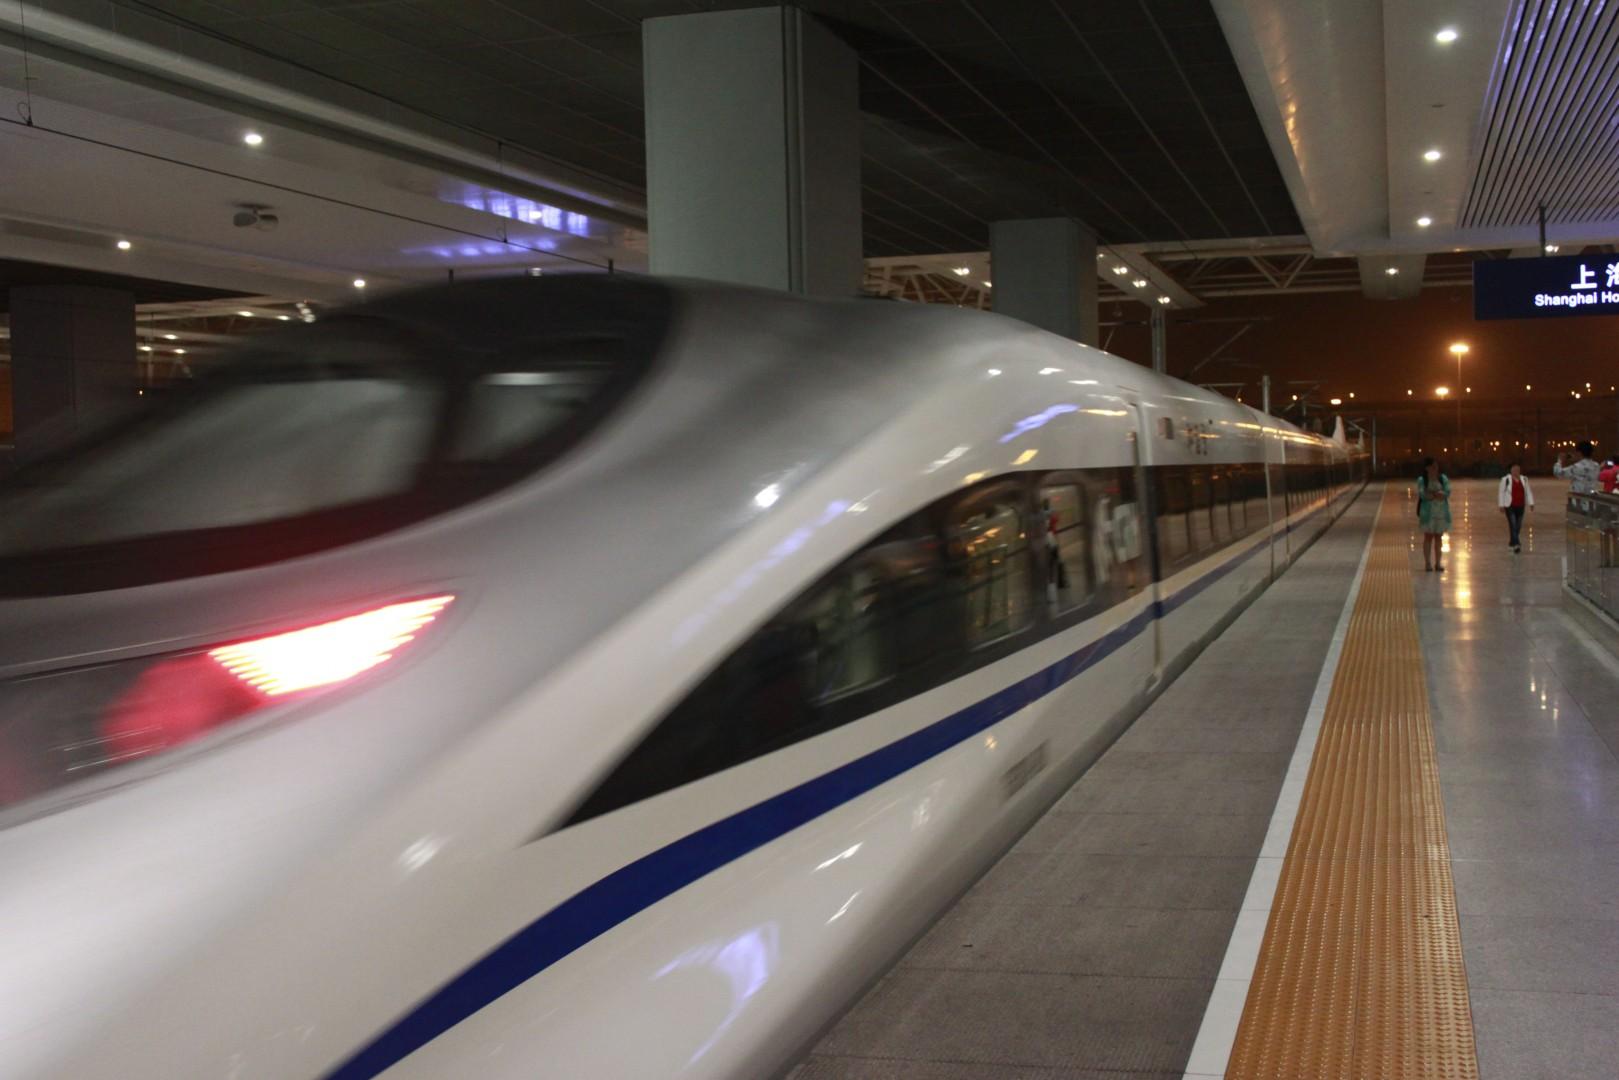 Tren de la serie CHR380A saliendo de Shanghai-Hongqia. Foto: Jucember.